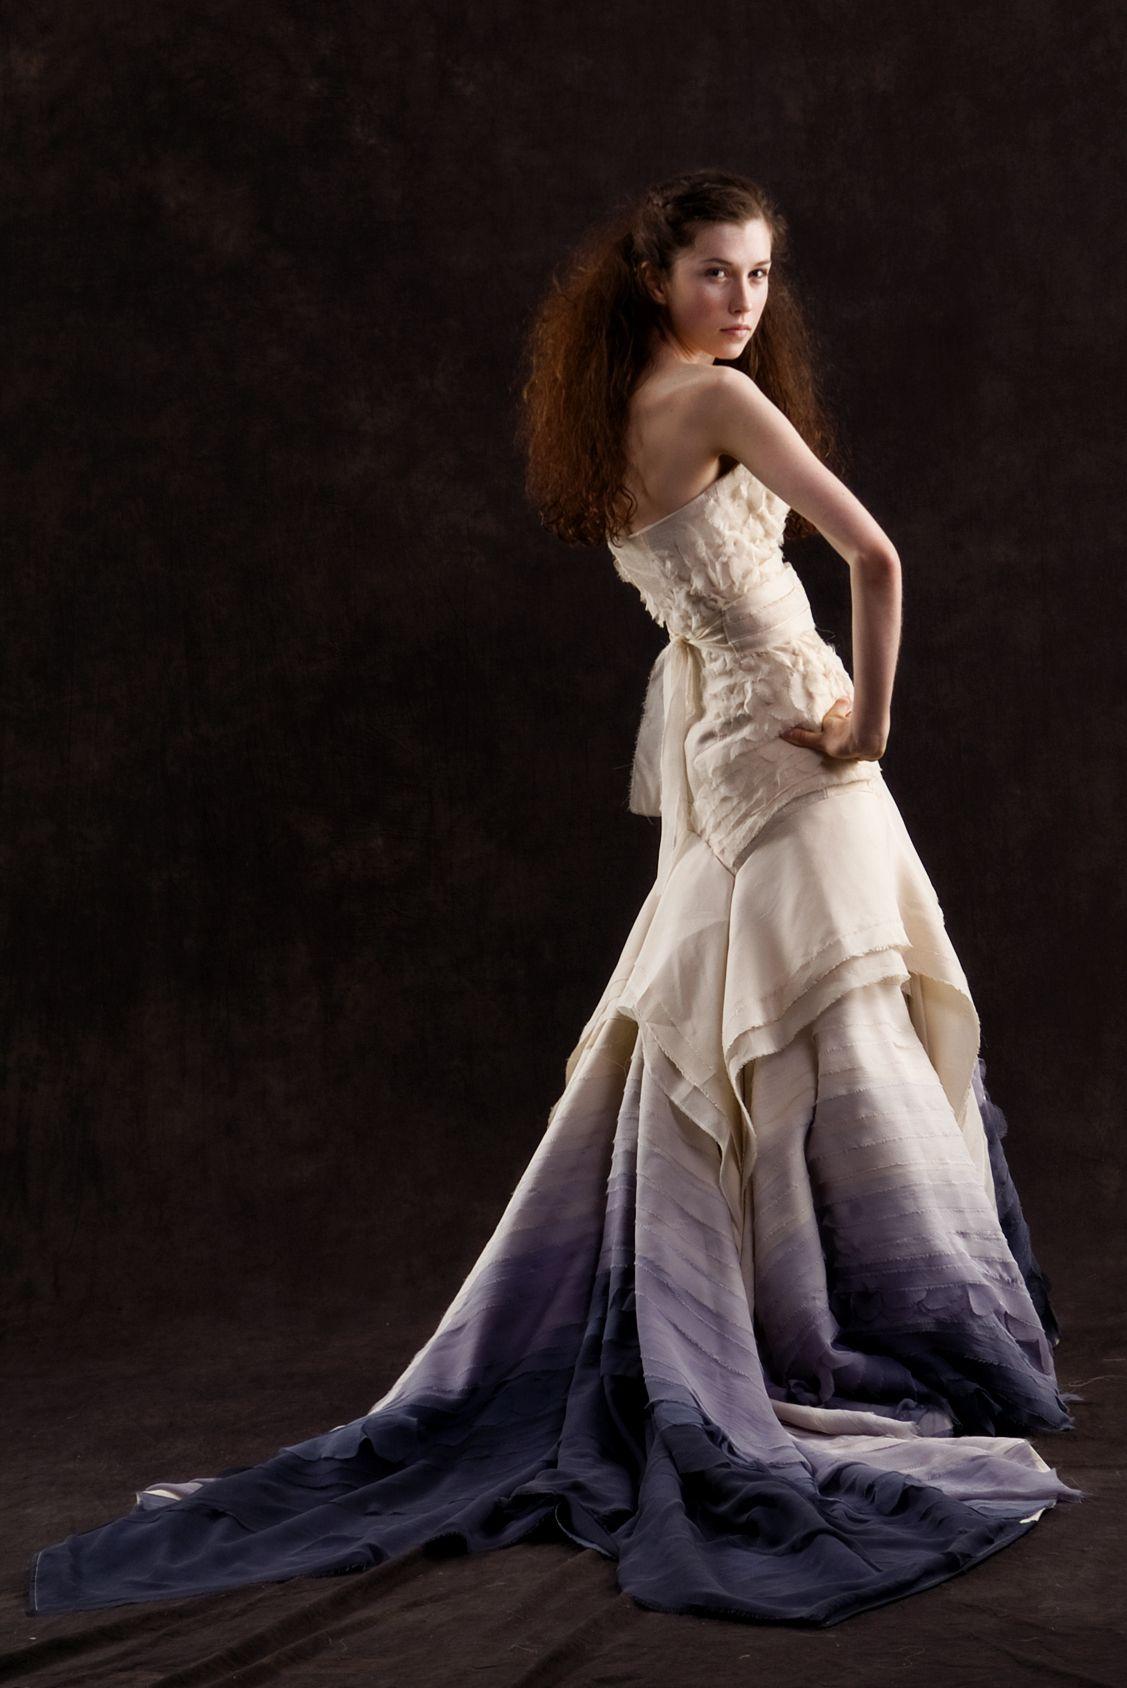 my wedding wishlist includes a Tara LaTour gown.  drool.